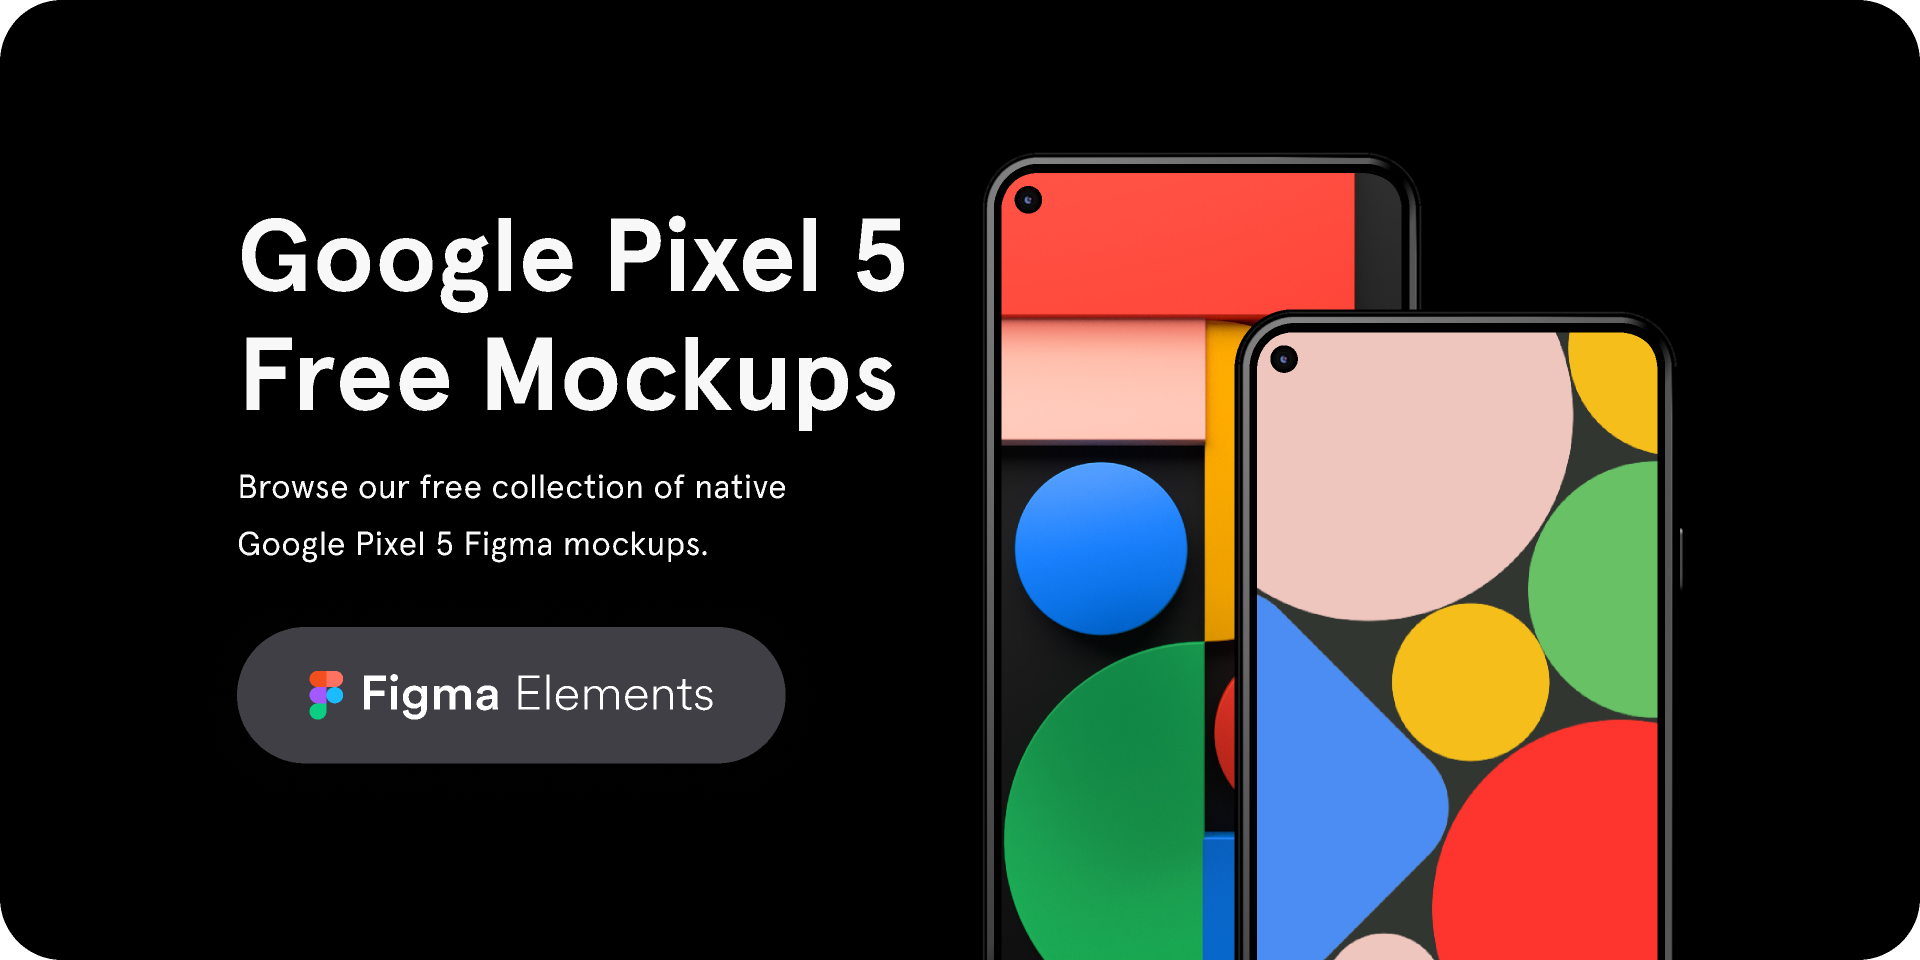 Figma freebie Google Pixel 5 Free Mockups